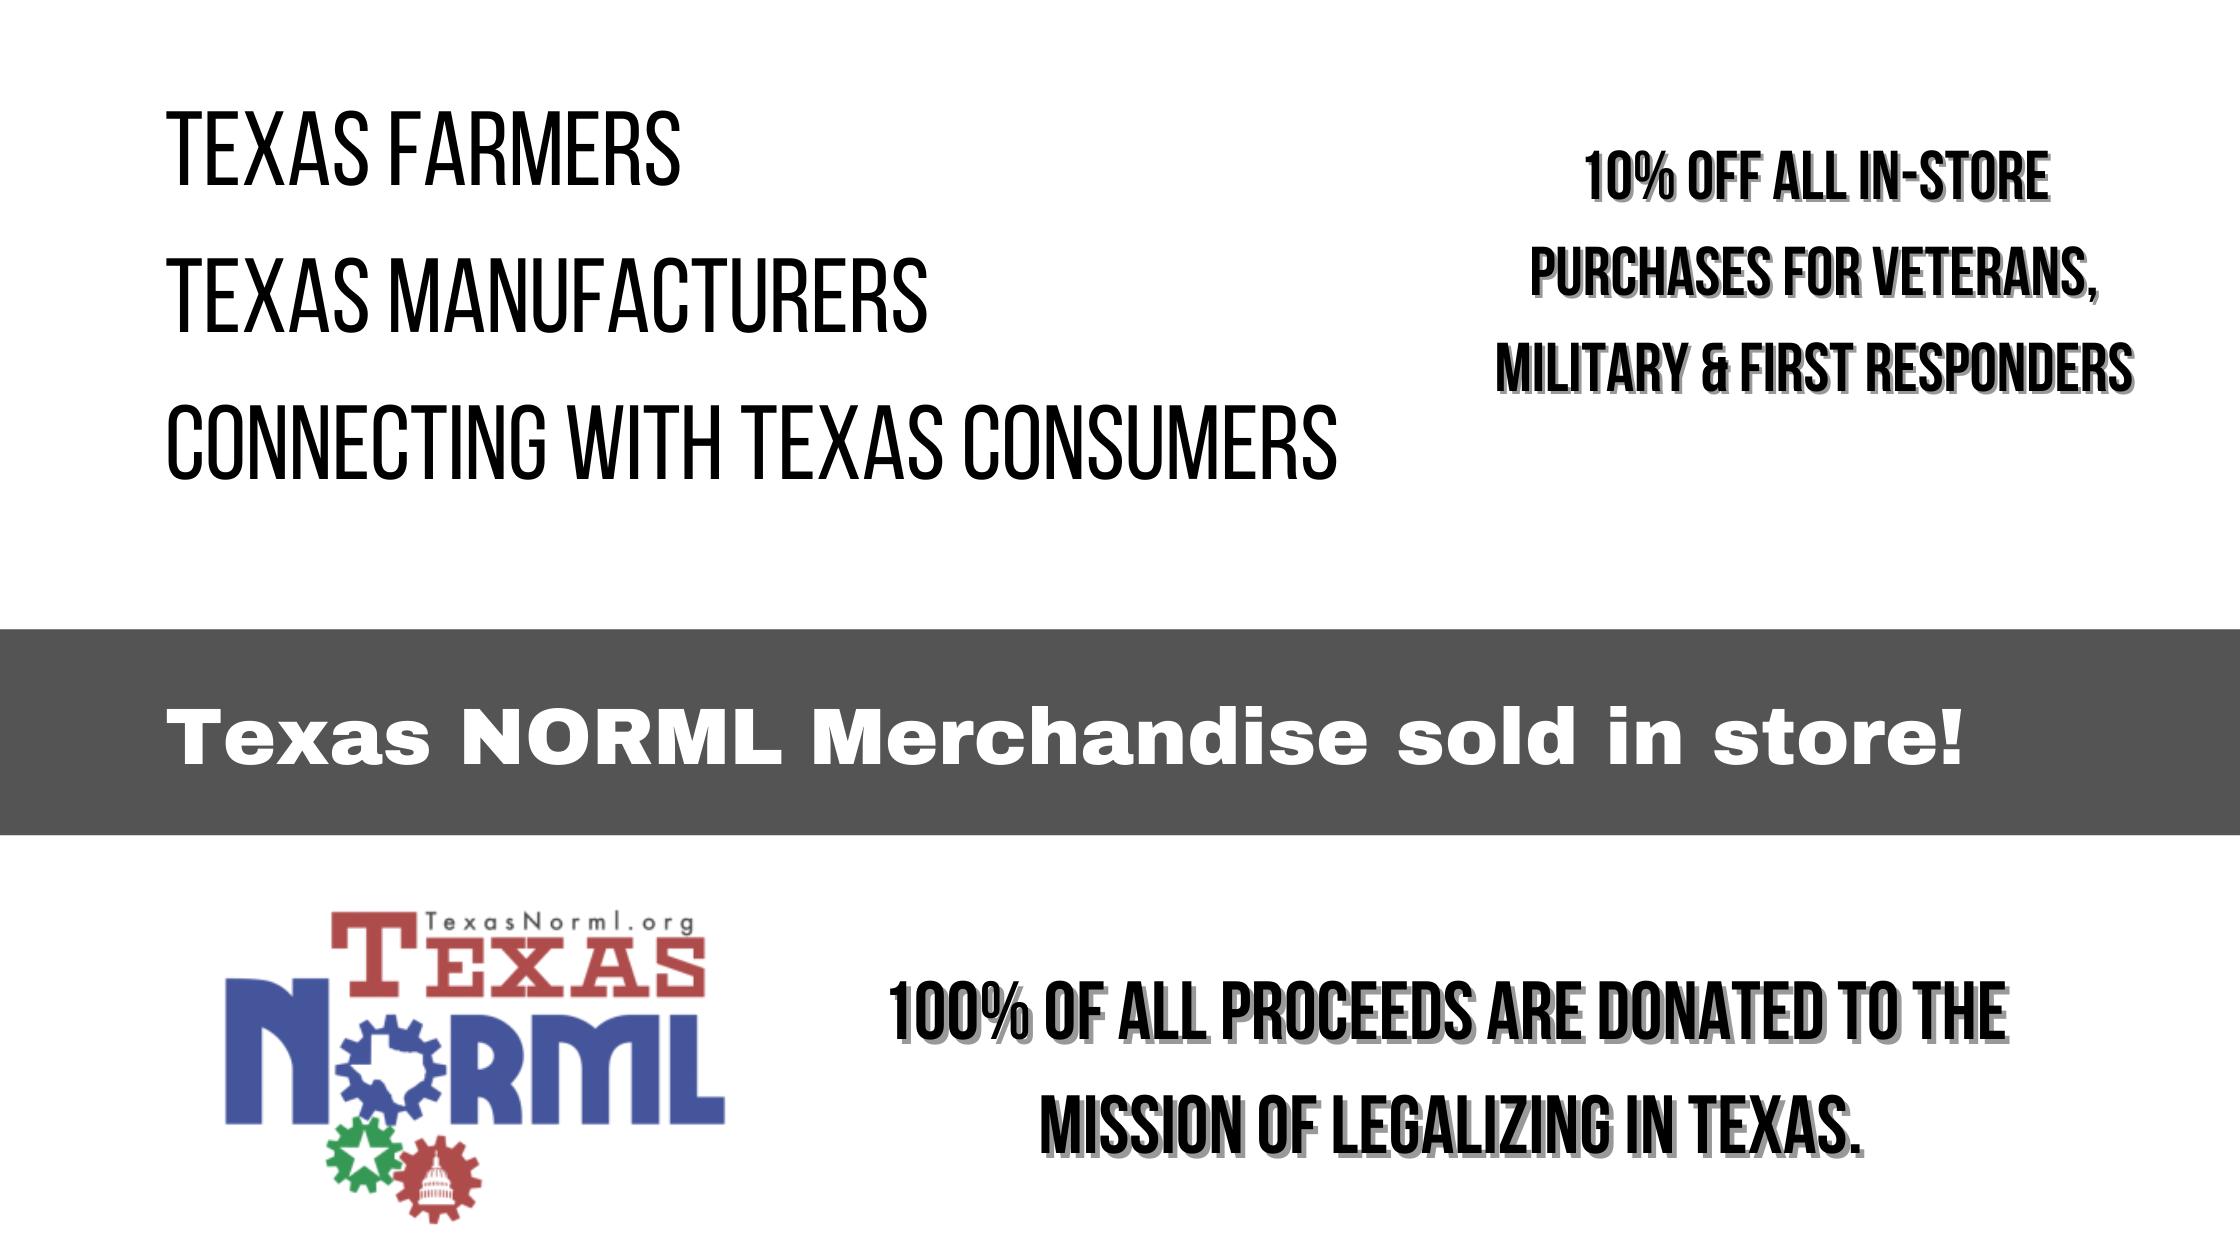 Texas Ban on Smokable Hemp Overturned